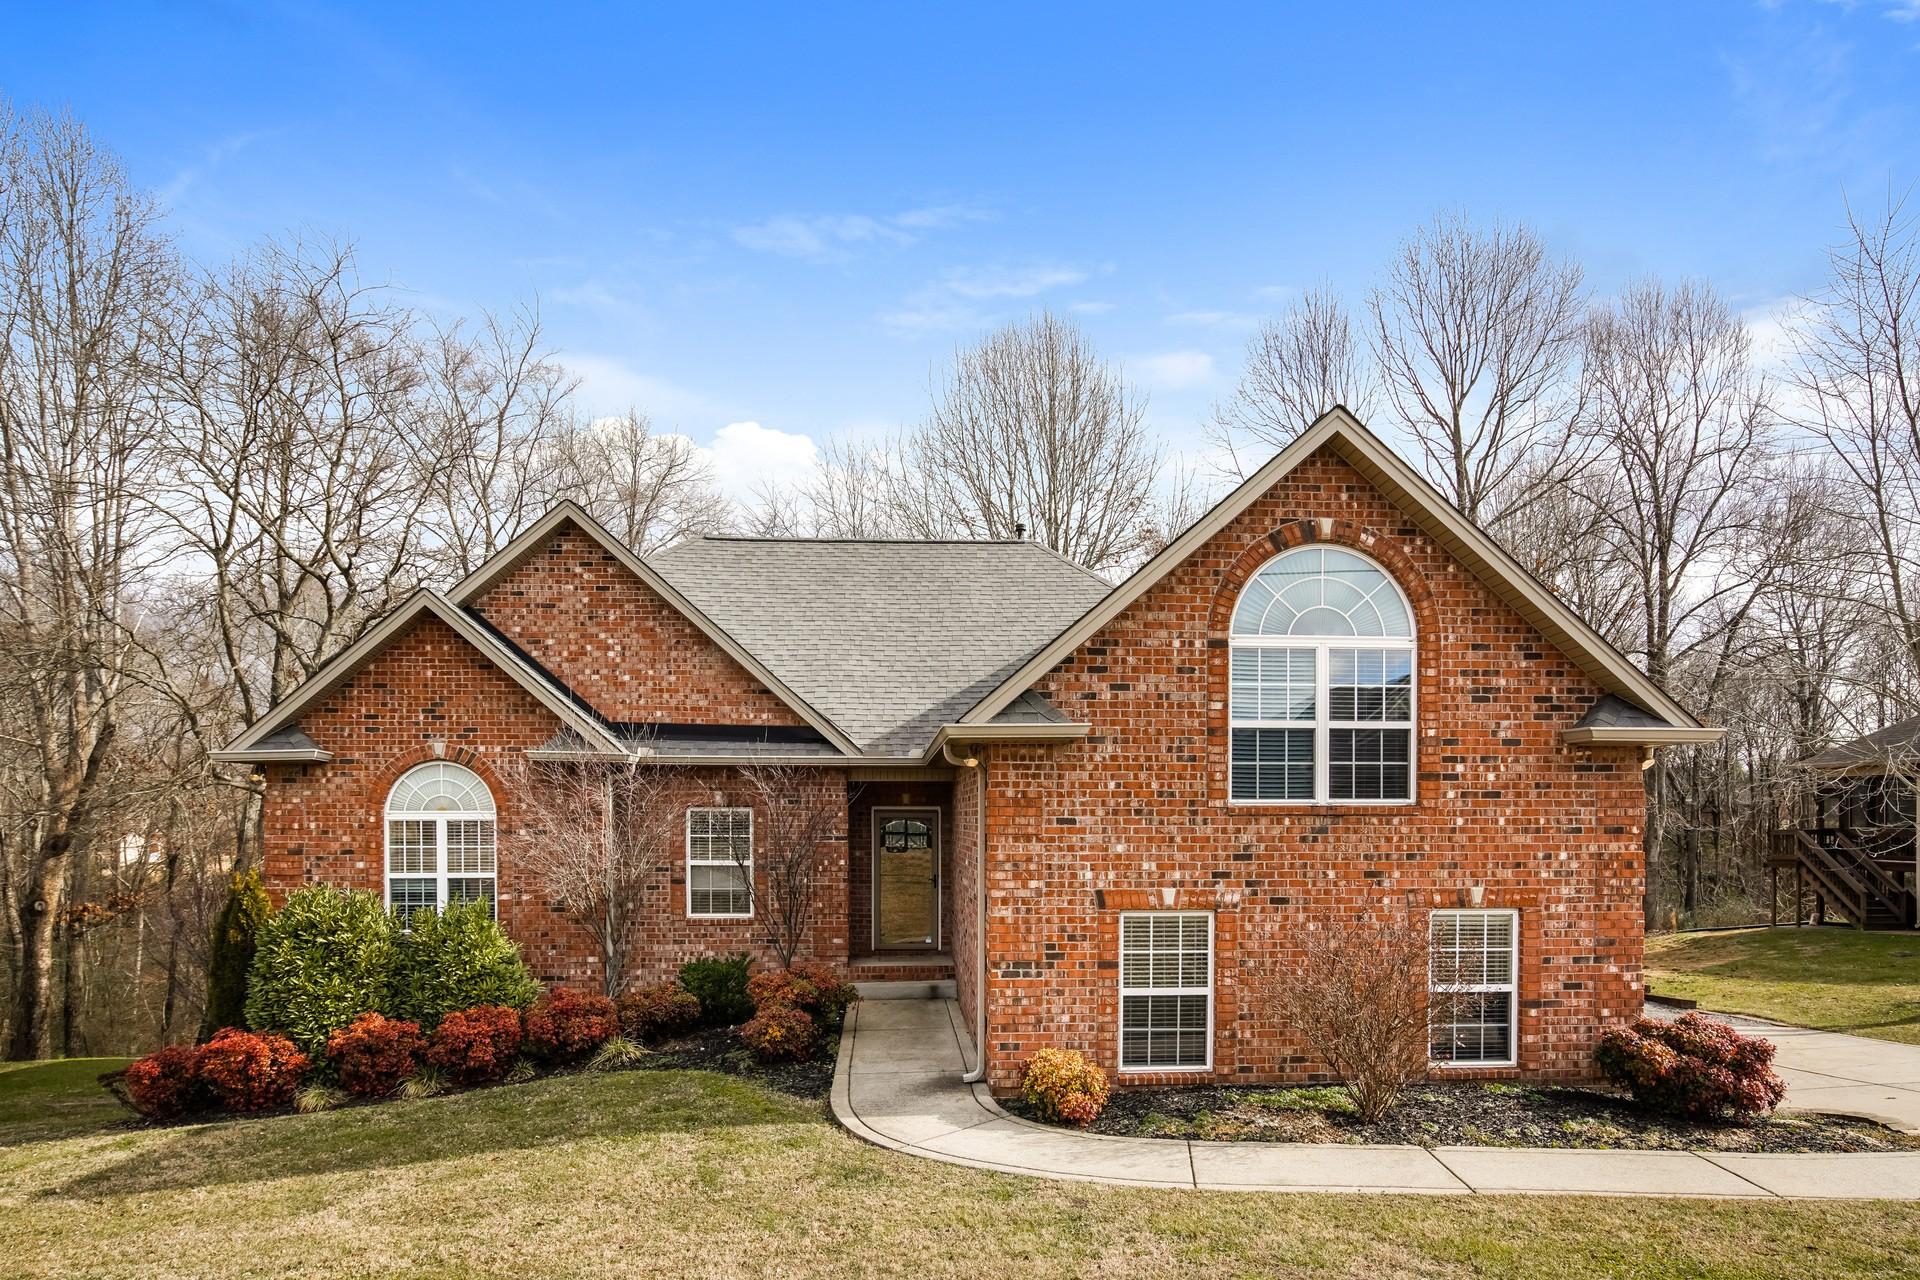 3017 Catoosa Ridge Ln Property Photo - Greenbrier, TN real estate listing